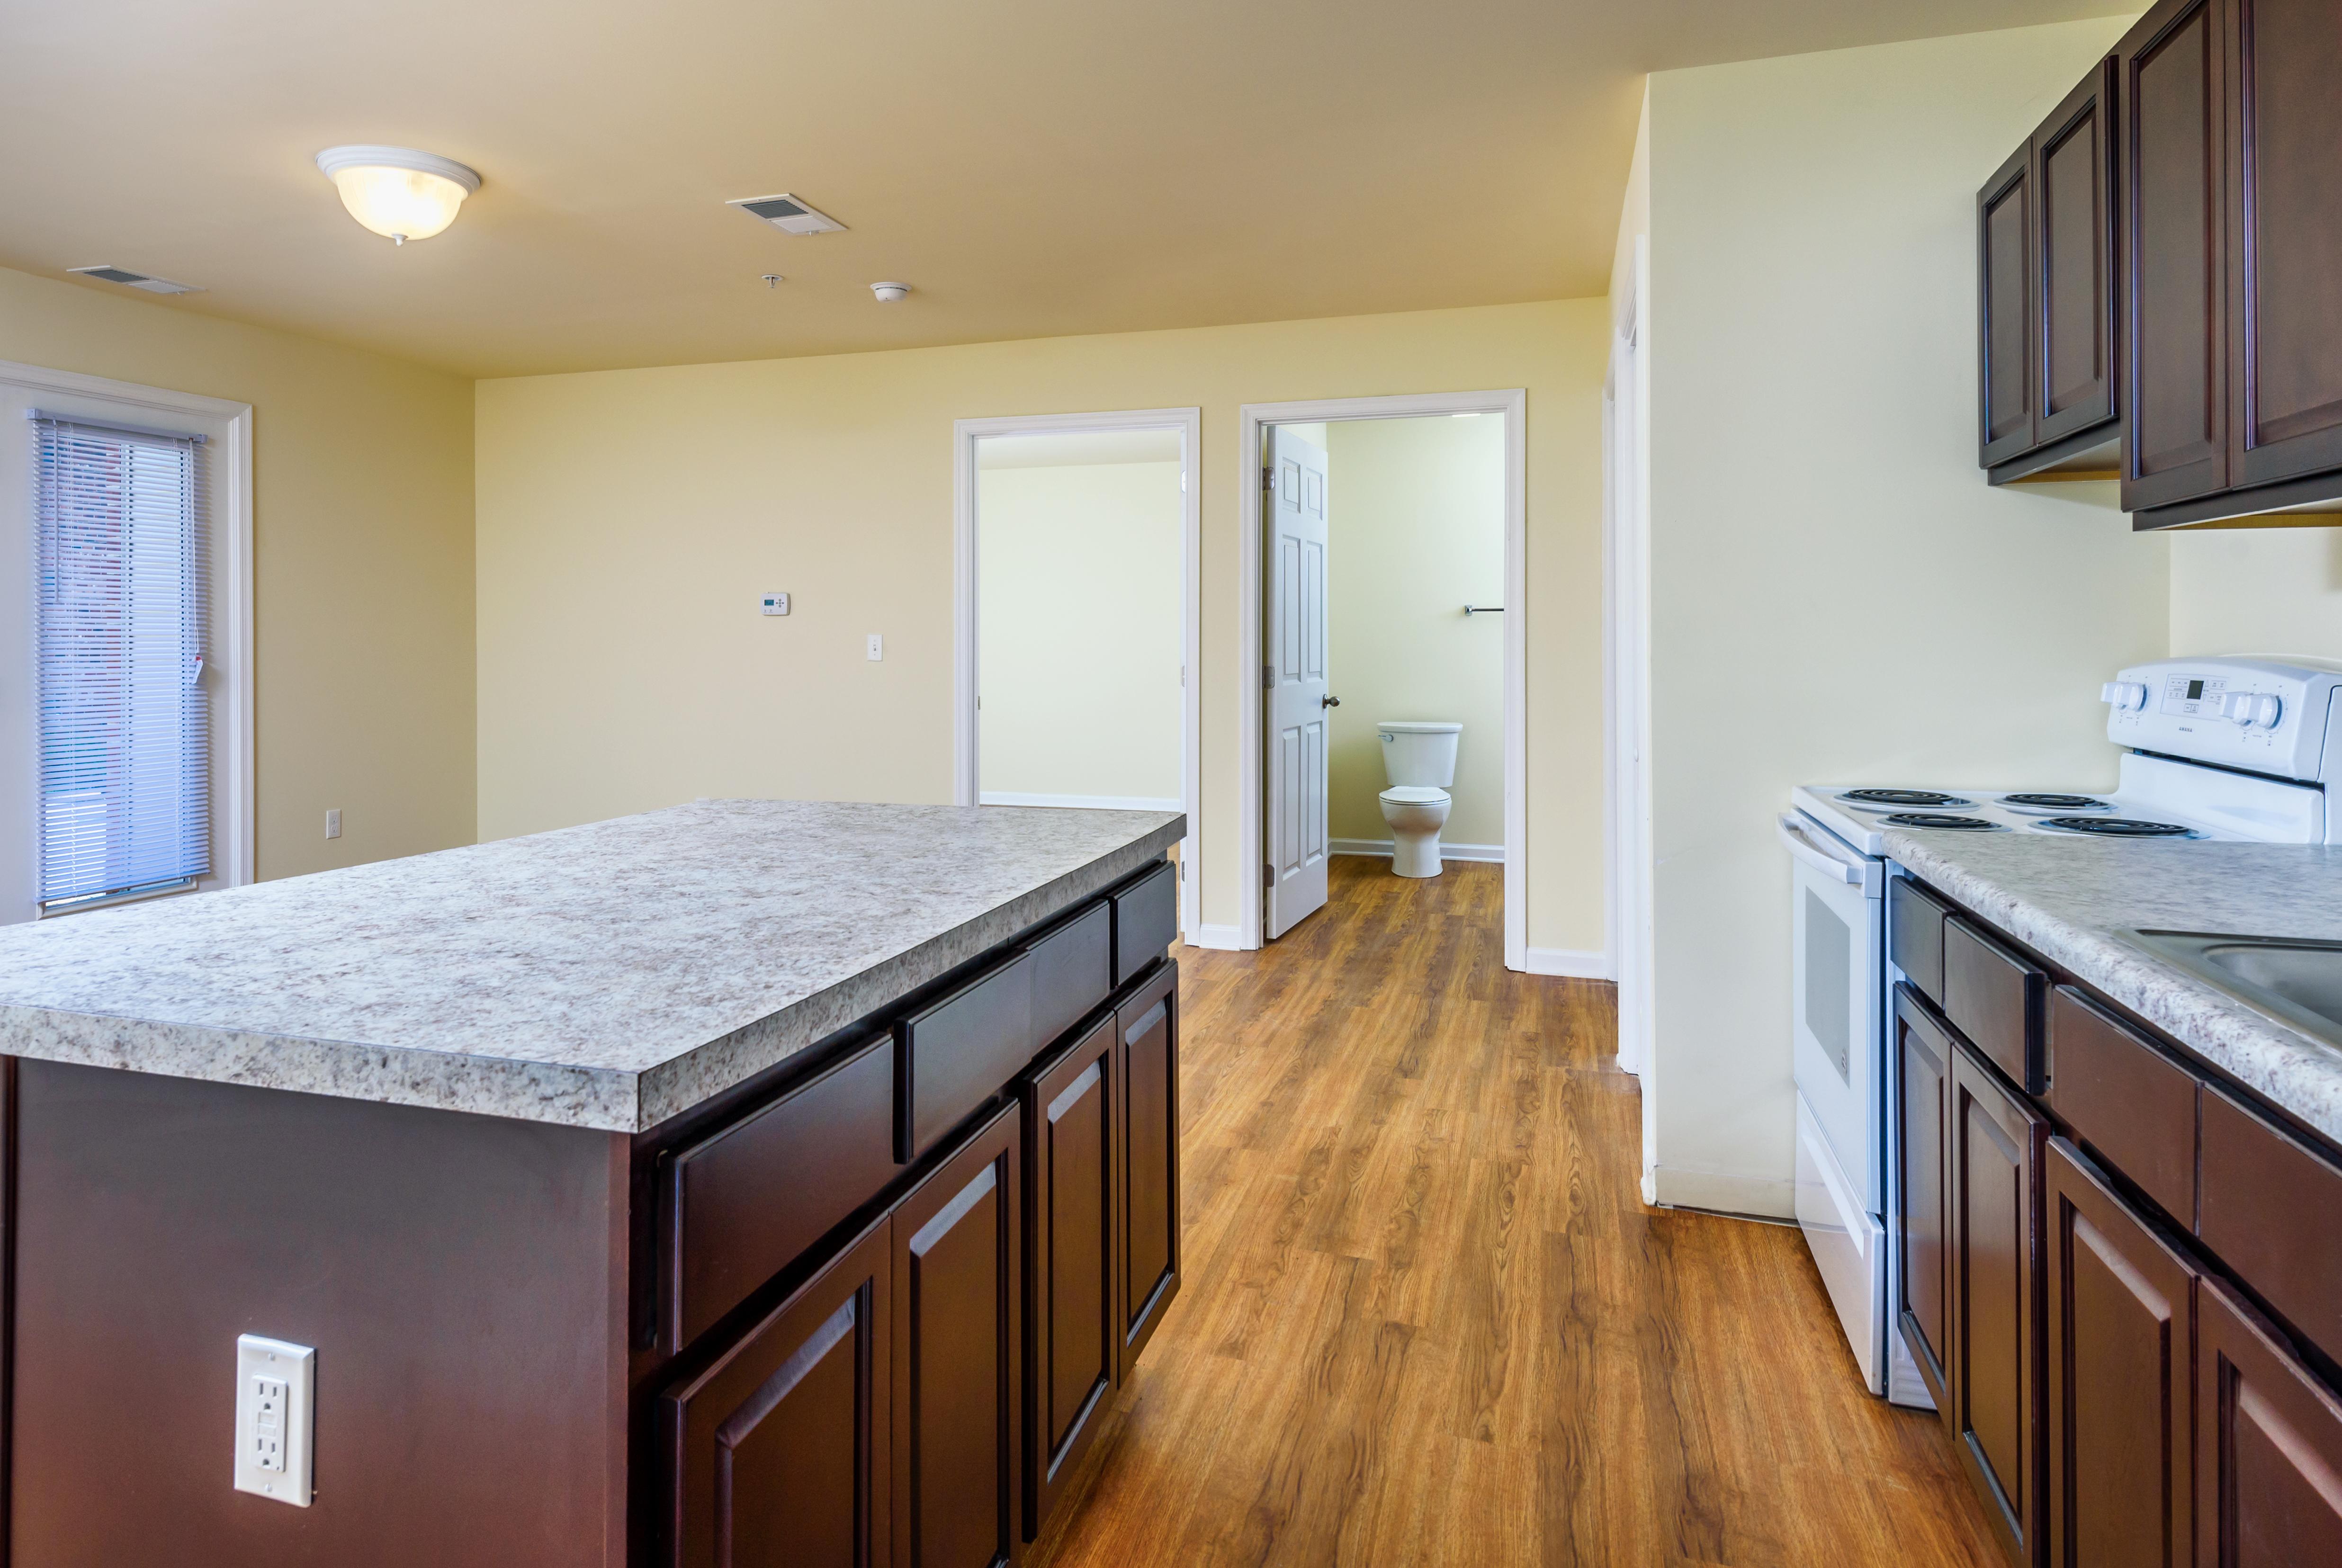 lofts-at-harbor-house-kitchen-island